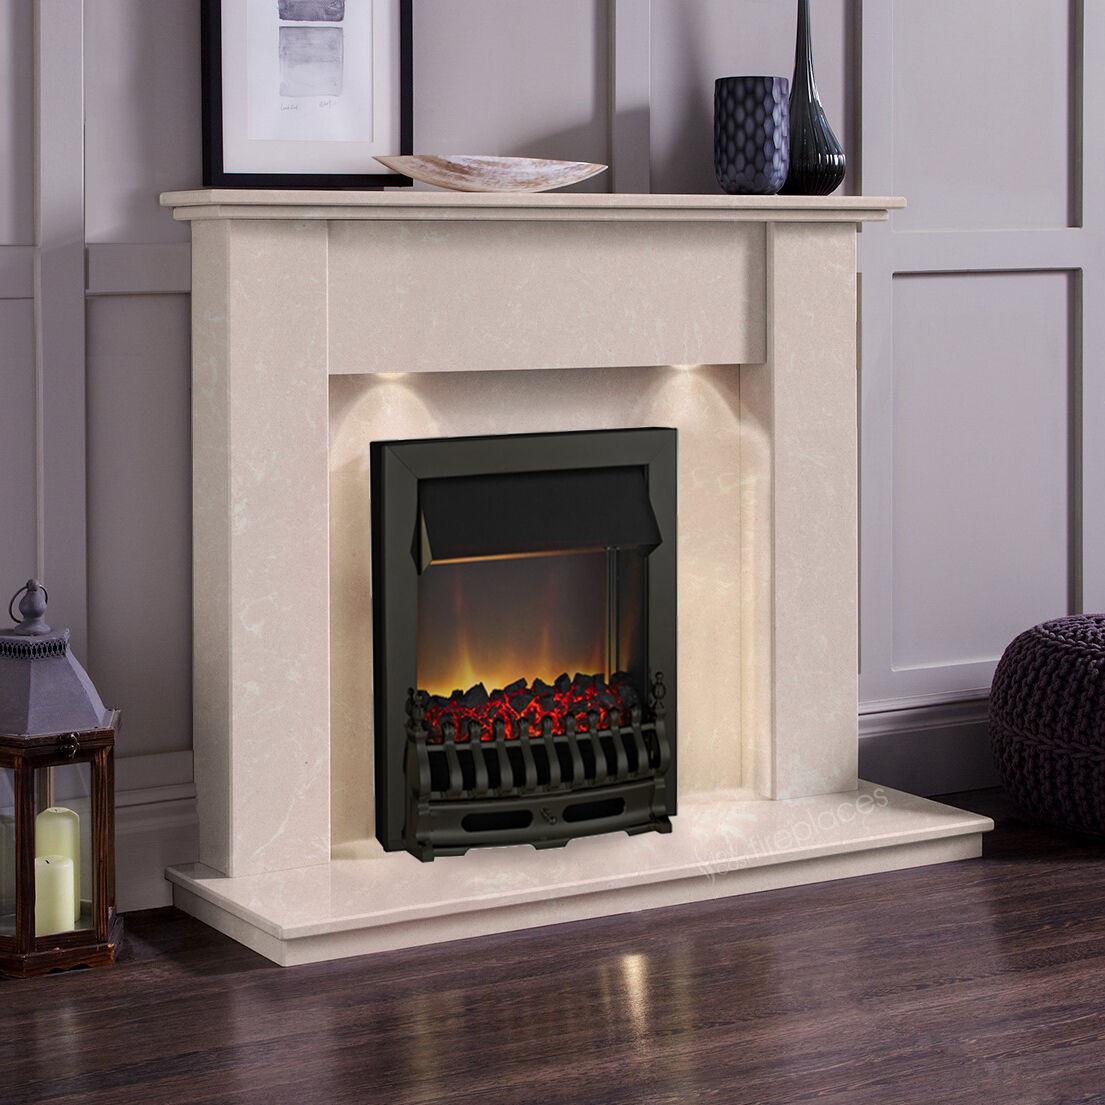 Marble Cream Stone Cheap Surround Black Electric Fire Fireplace Suite Spotlights Ebay